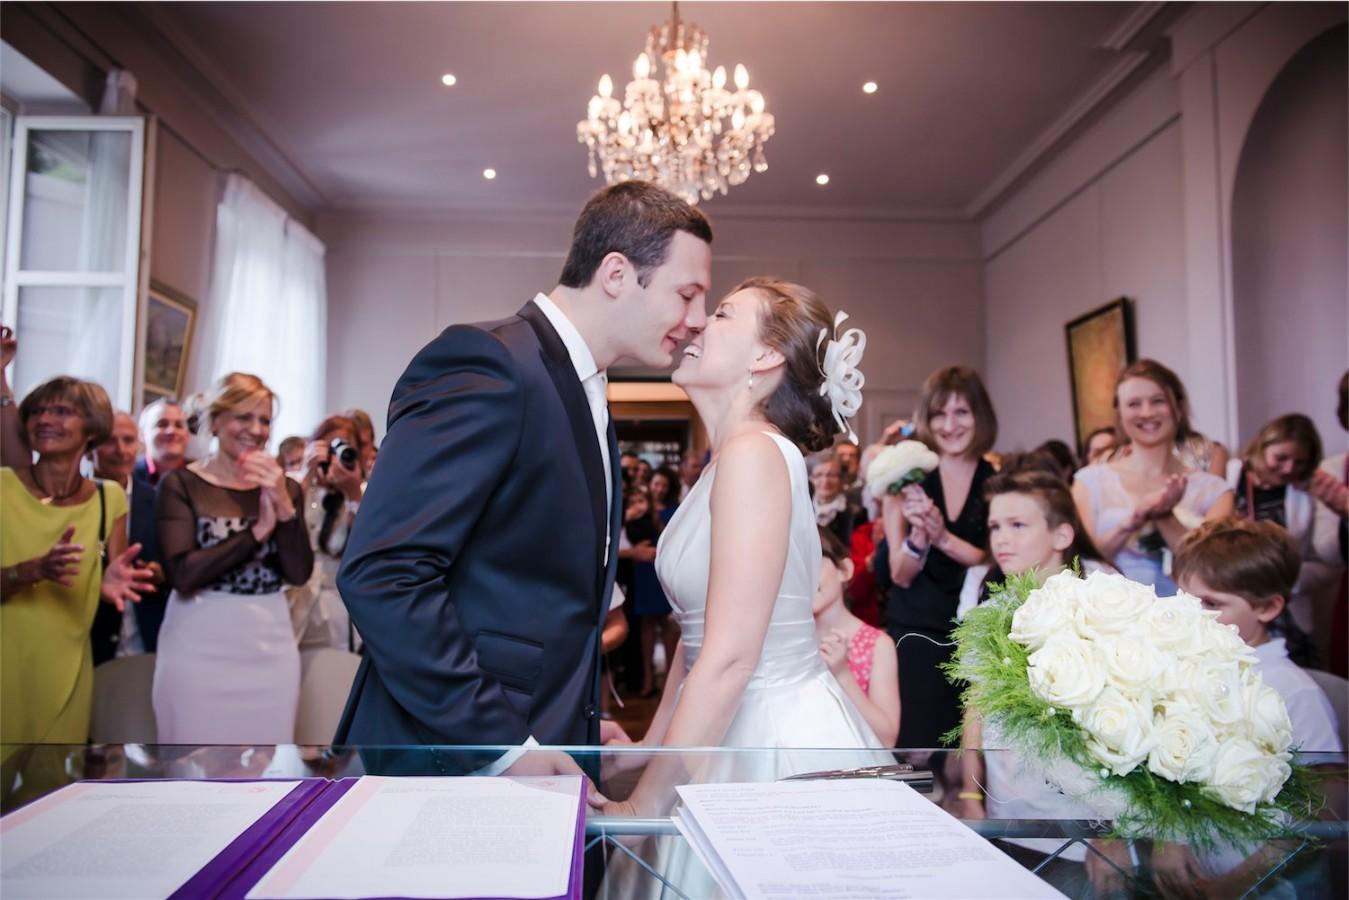 Cérémonie civile Photographe mariage grenoble Isere Marie-Cat